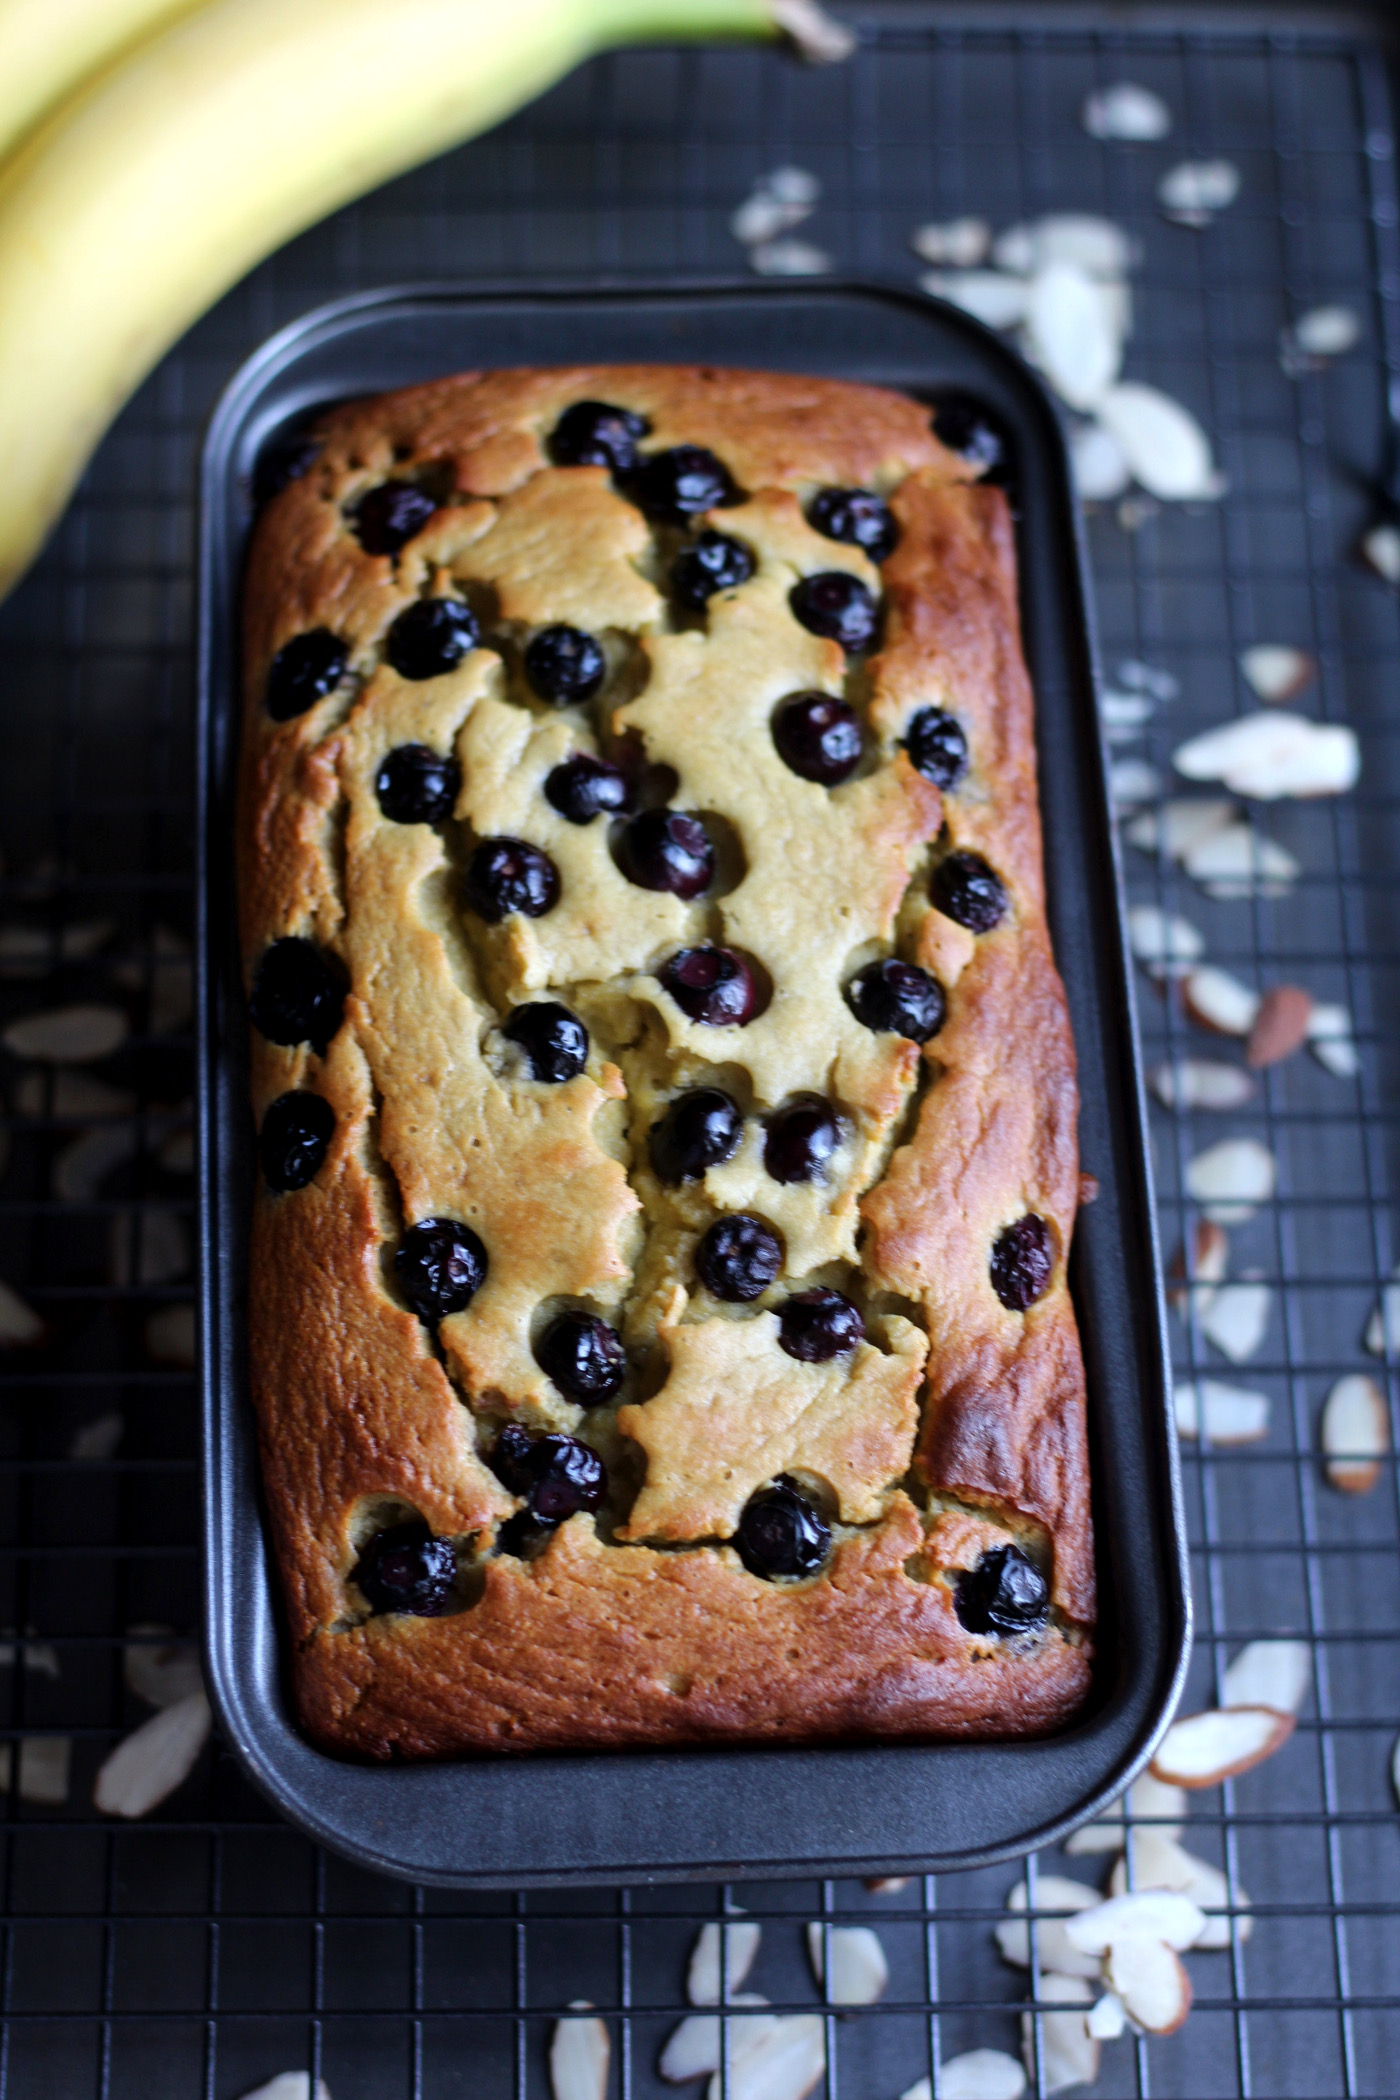 Almond Flour Blueberry Banana Bread